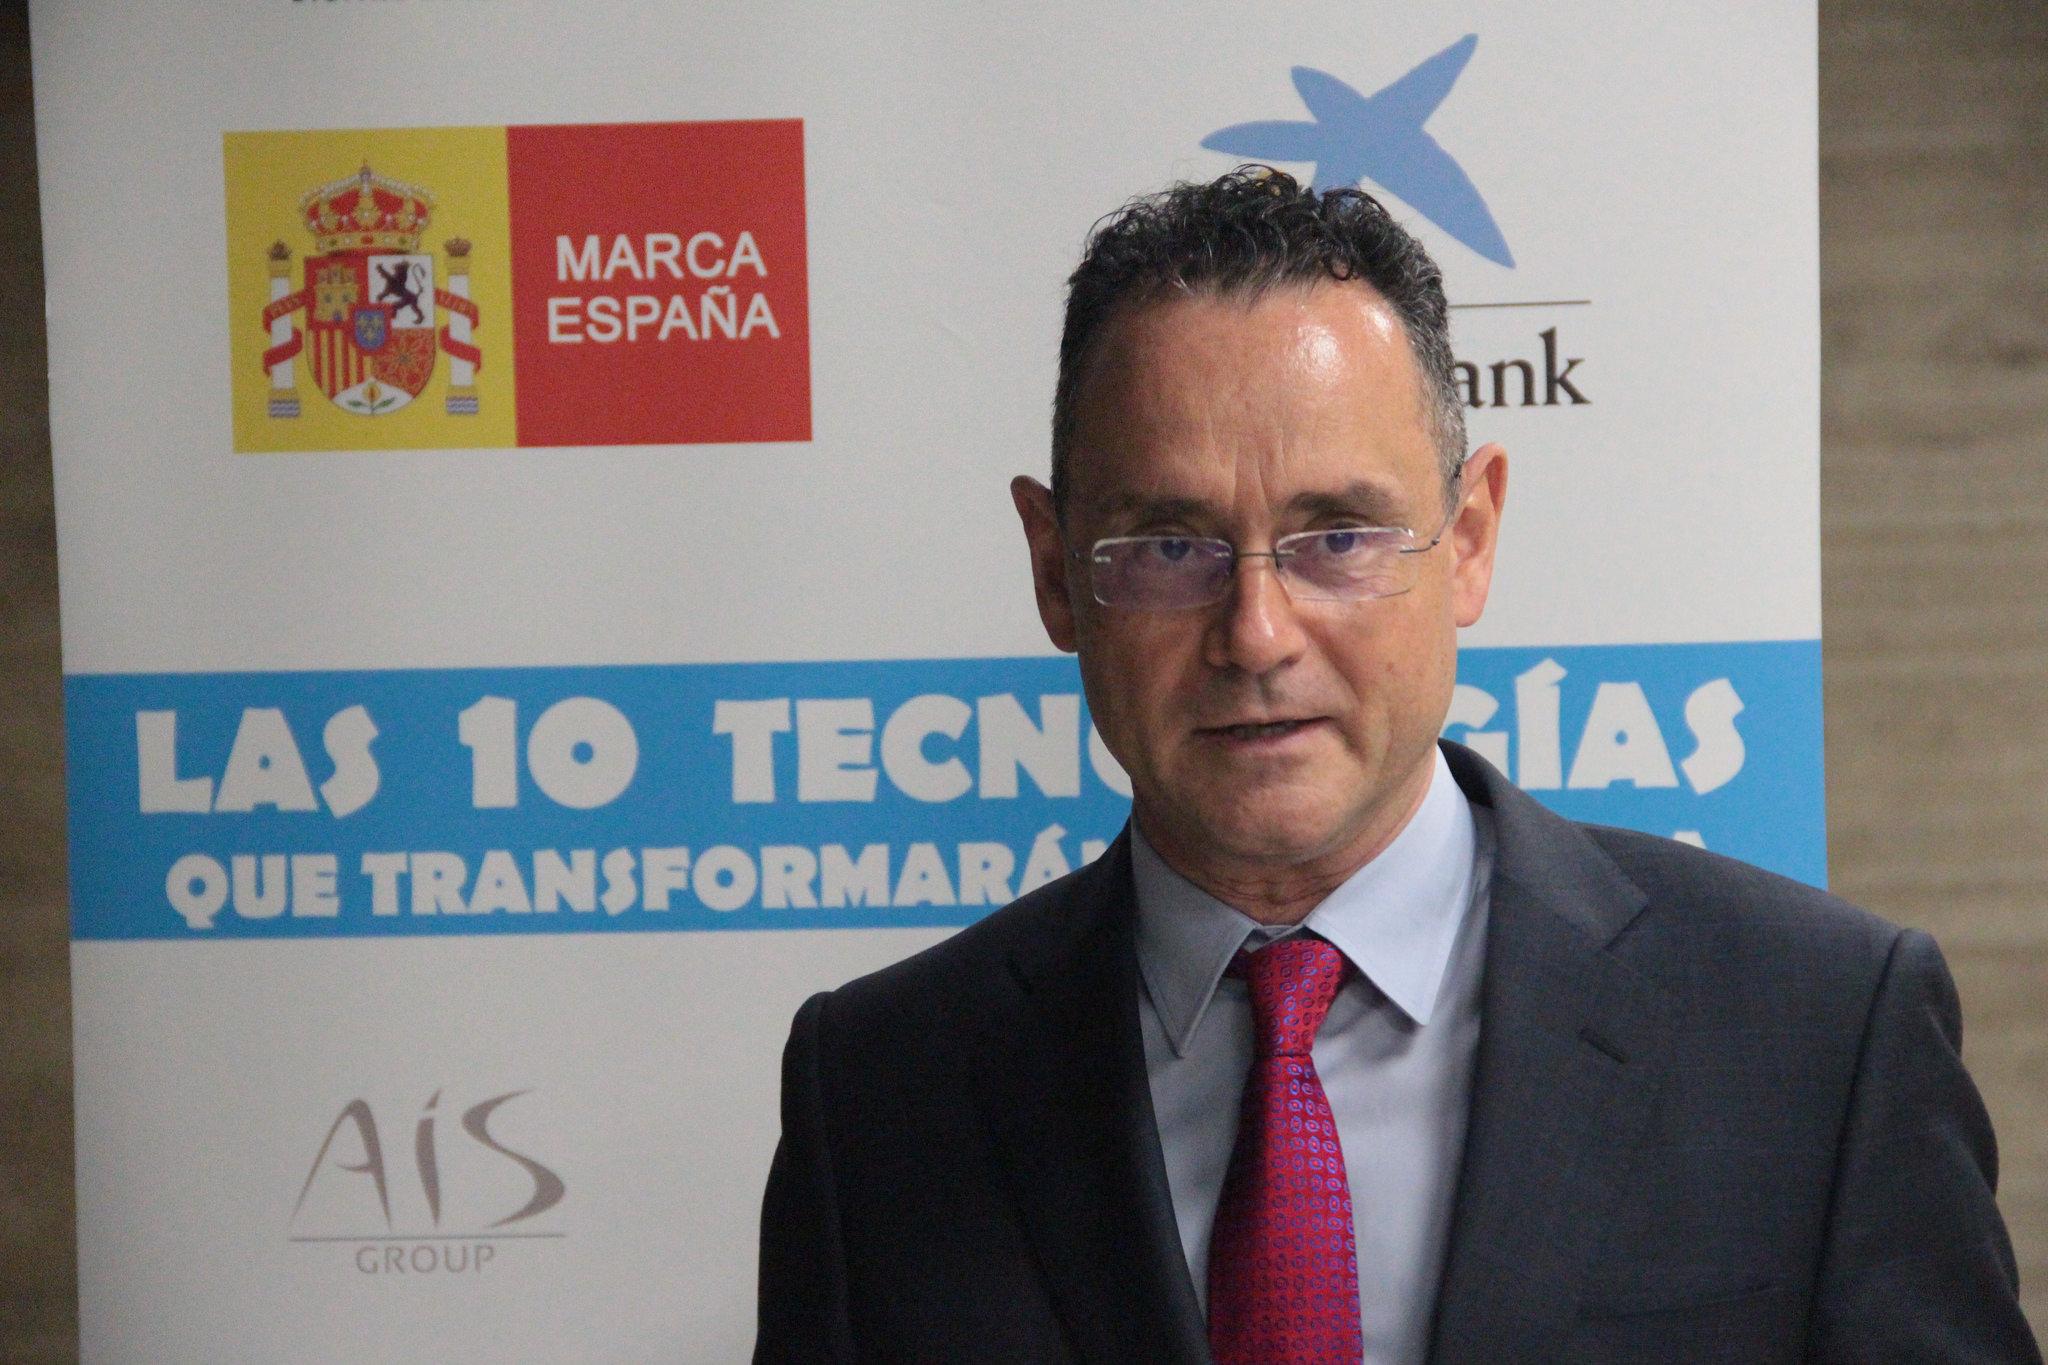 30 expertos desgranan el futuro tecnol gico en ecofin 2018 - Pedro banos libros ...